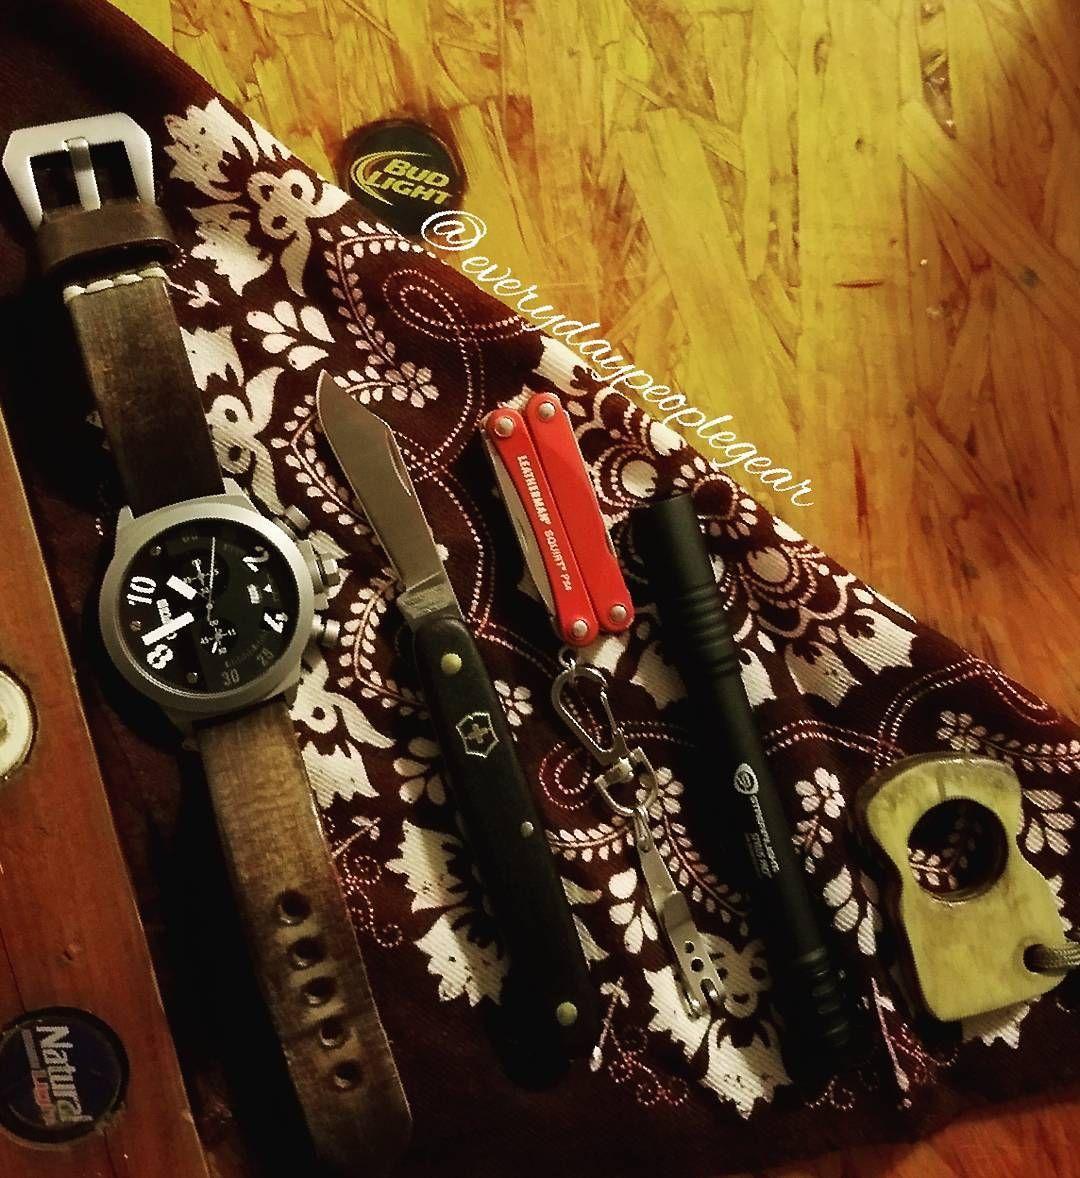 "EVERYDAY PEOPLE GEAR (@everydaypeoplegear) on Instagram: ""#atthebar #pocketdump #breedwatches #victorinox #leatherman #leathermansquirtps4 #streamlight…"""